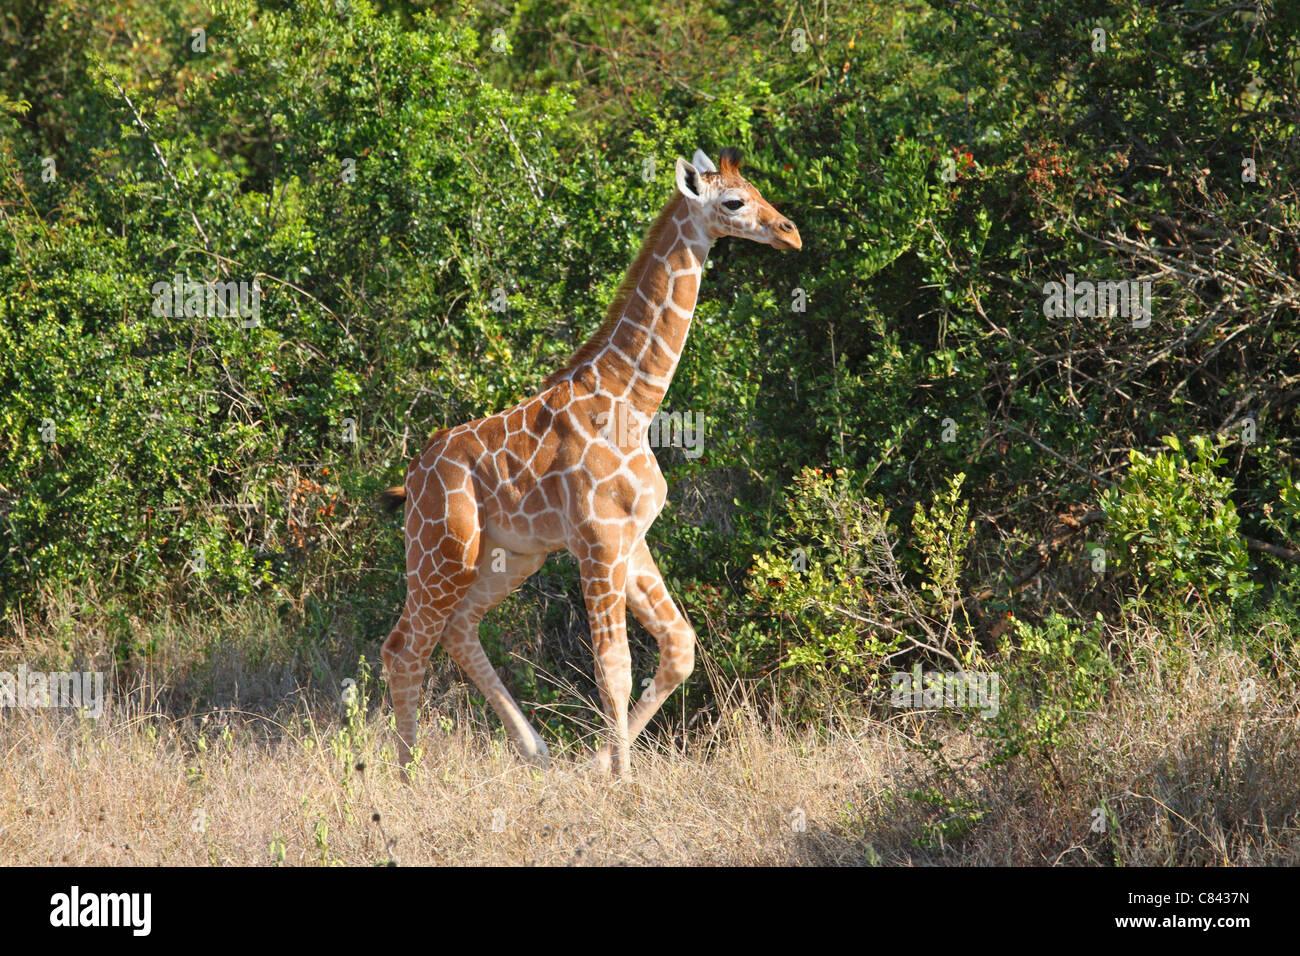 Giraffe réticulée - cub / Giraffa camelopardalis reticulata Banque D'Images